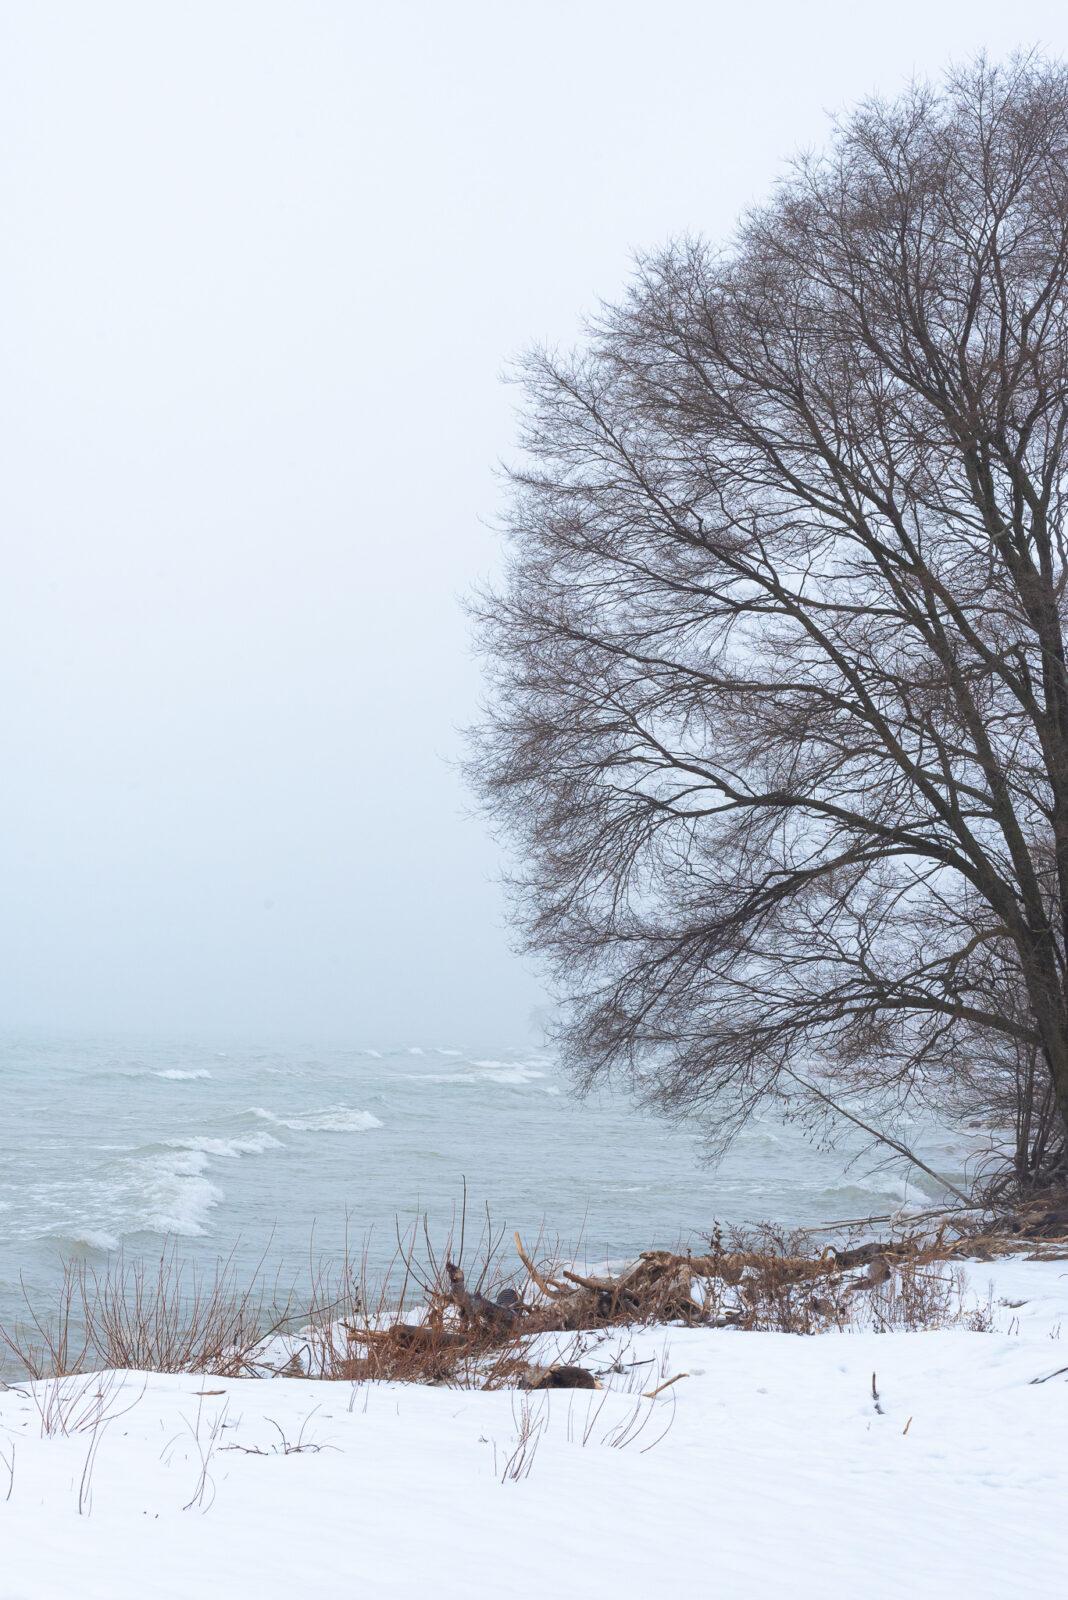 big tree on the snowy bank of Lake Michigan east shore